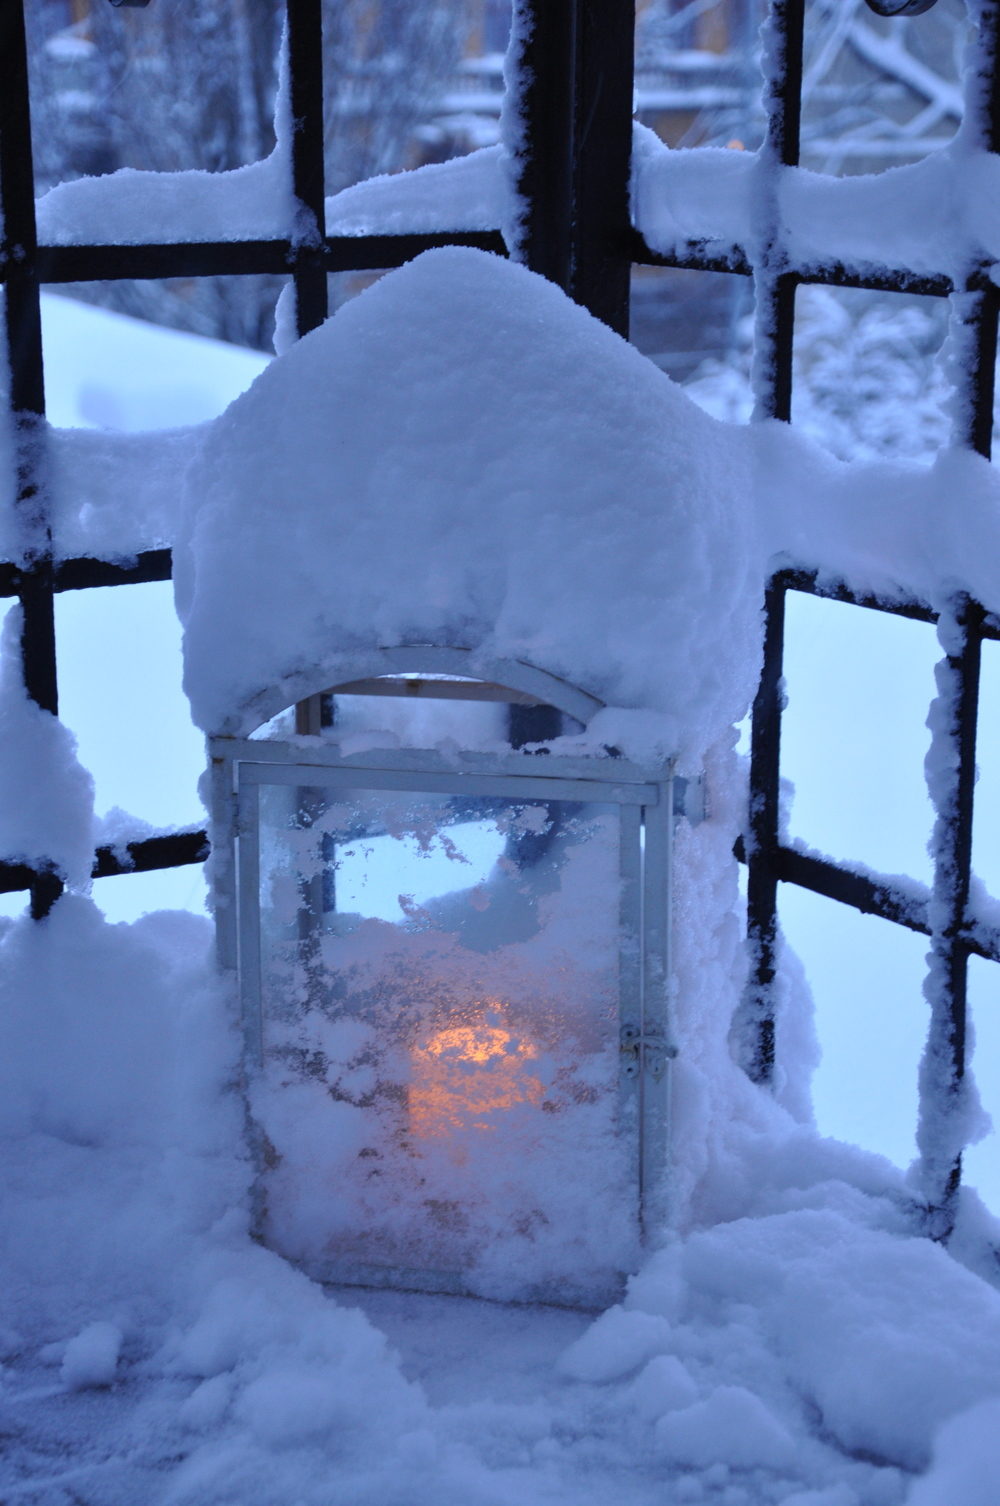 Ljuslykta i vinterskrud   Foto:  Palatsliv